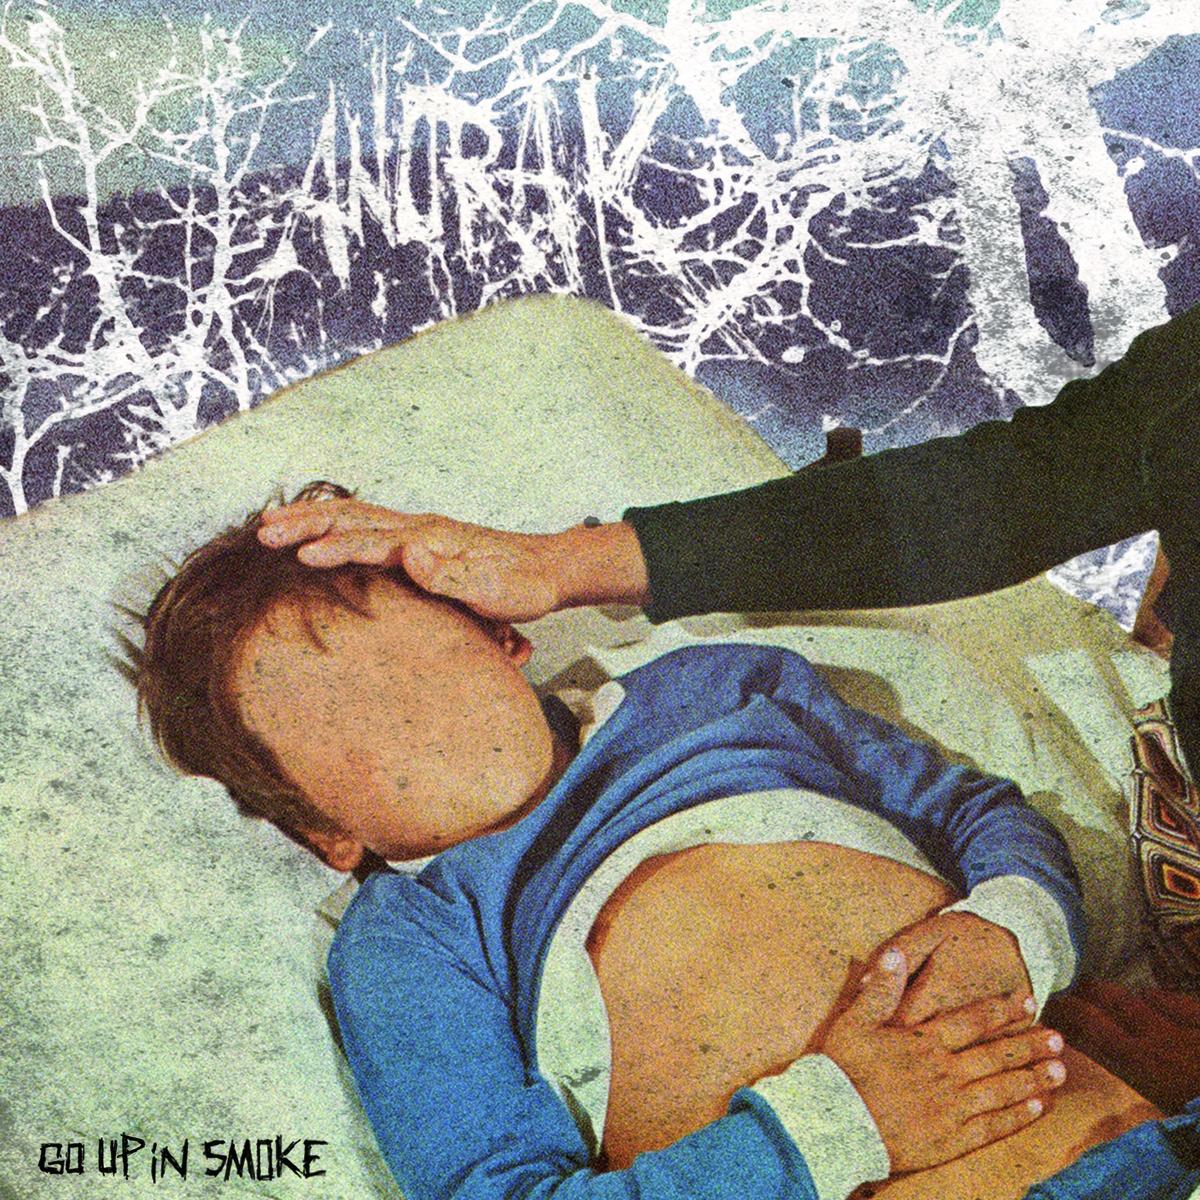 ANORAK Go up in smoke LP